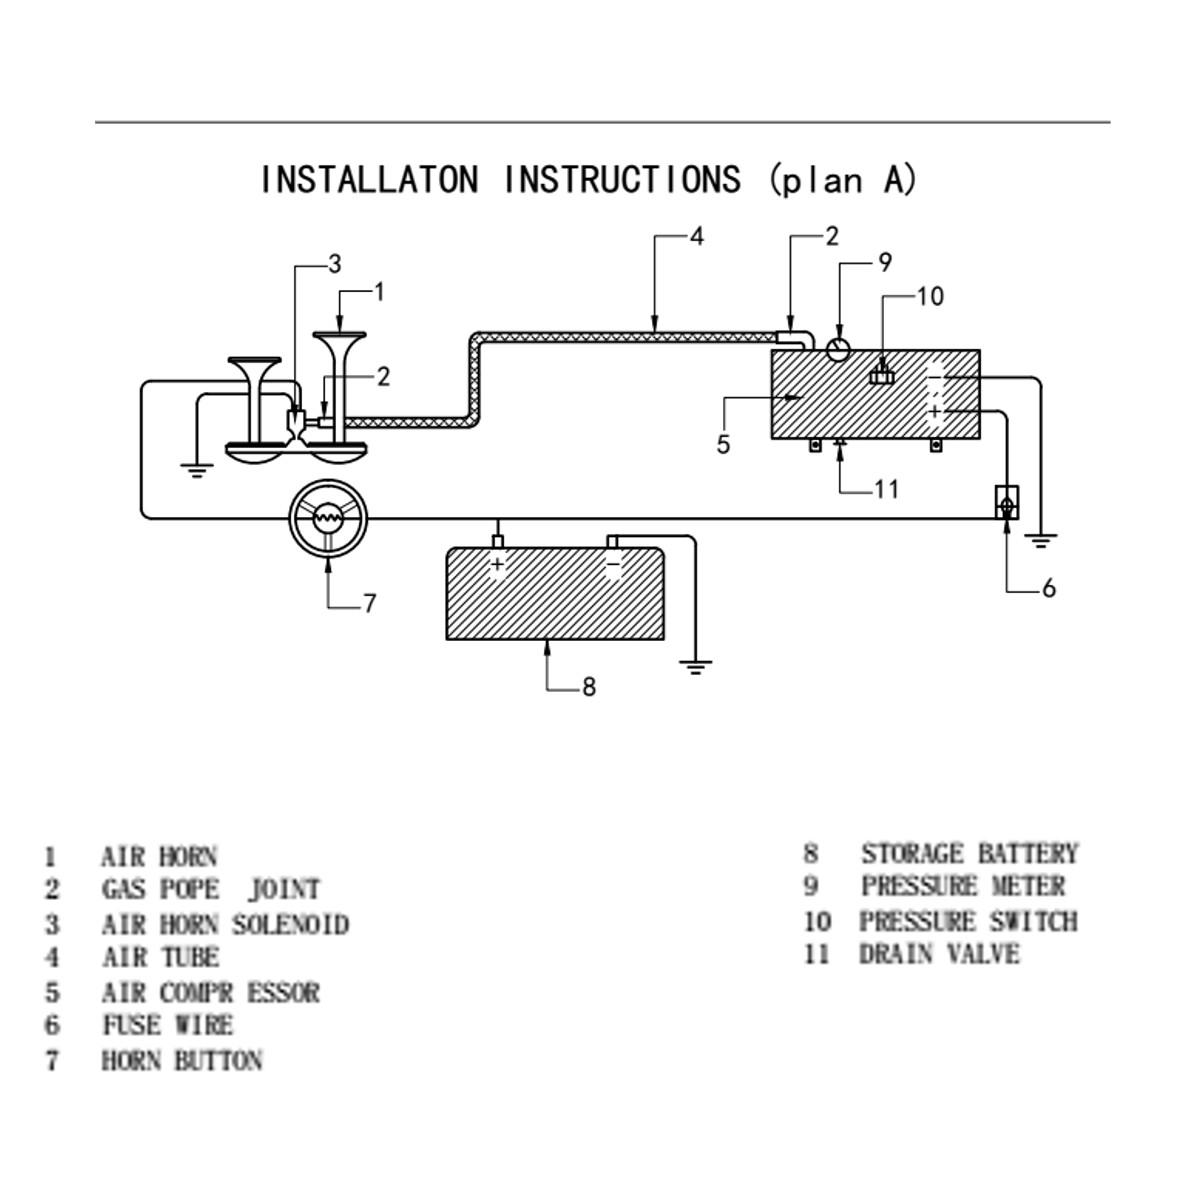 hight resolution of 4 trumpet vehicle car air horn 12v 24v compressor tubing 150db train 120 psi kit walmart com